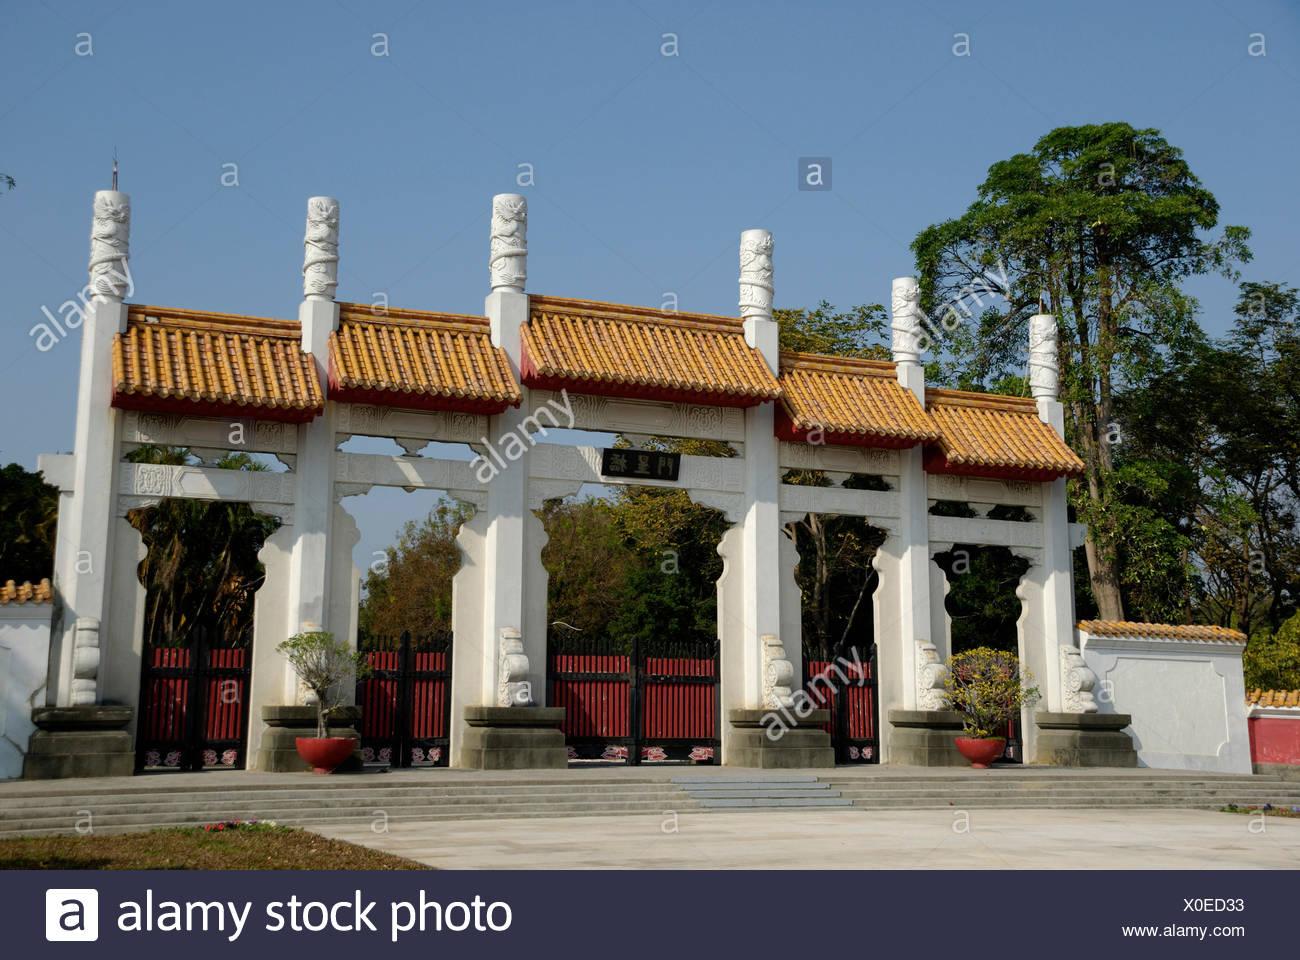 Goal Passage Gate Archgway Gantry Input Port Taiwan